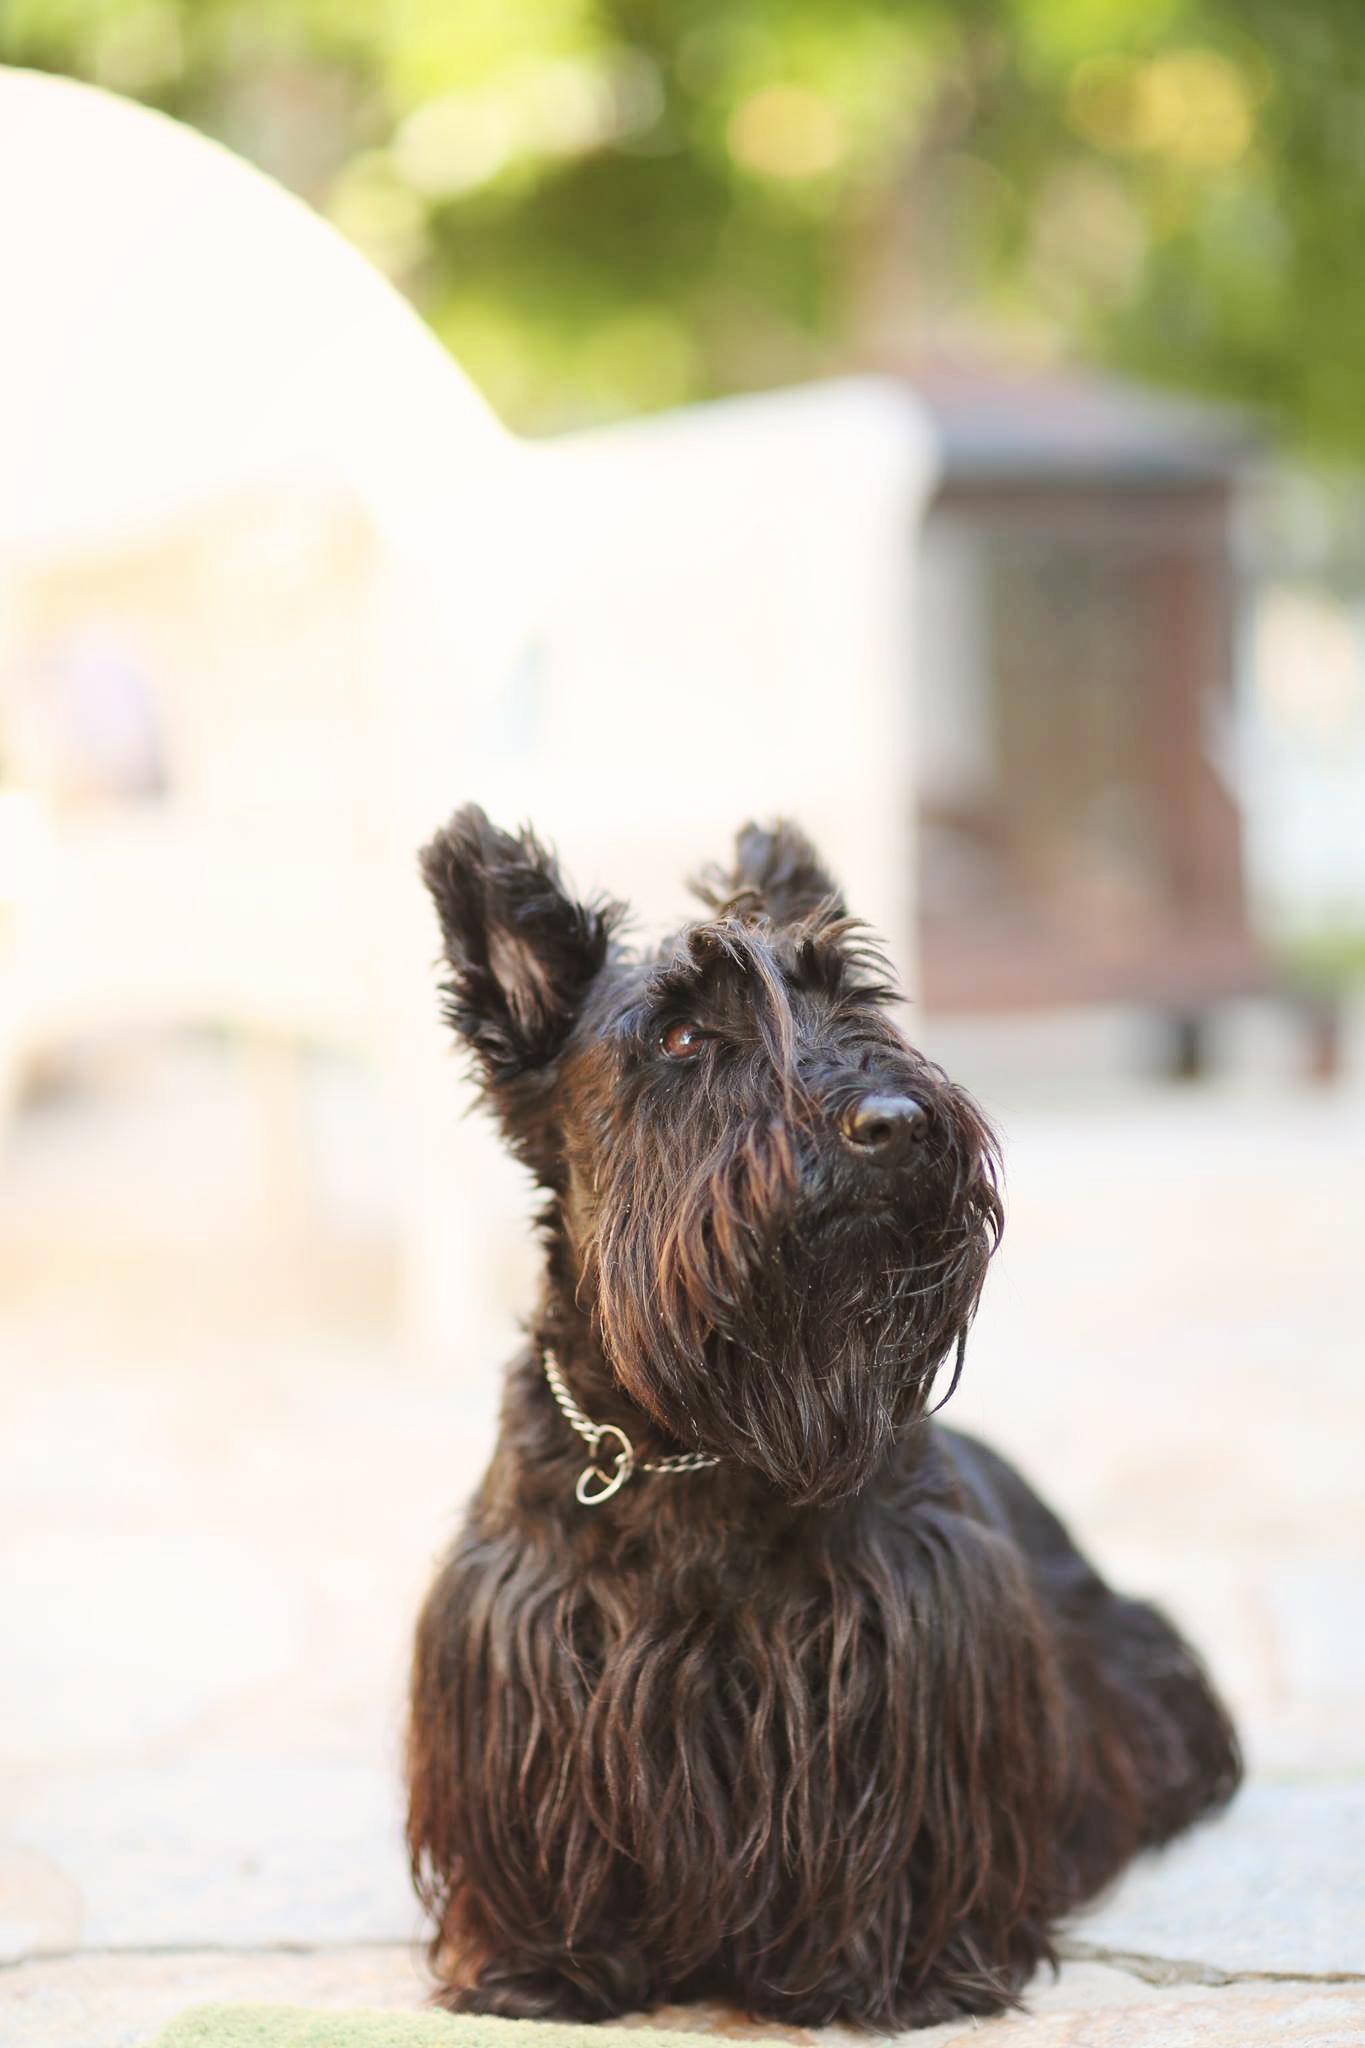 Cute black scotty dog at the beach. Doggy portrait.